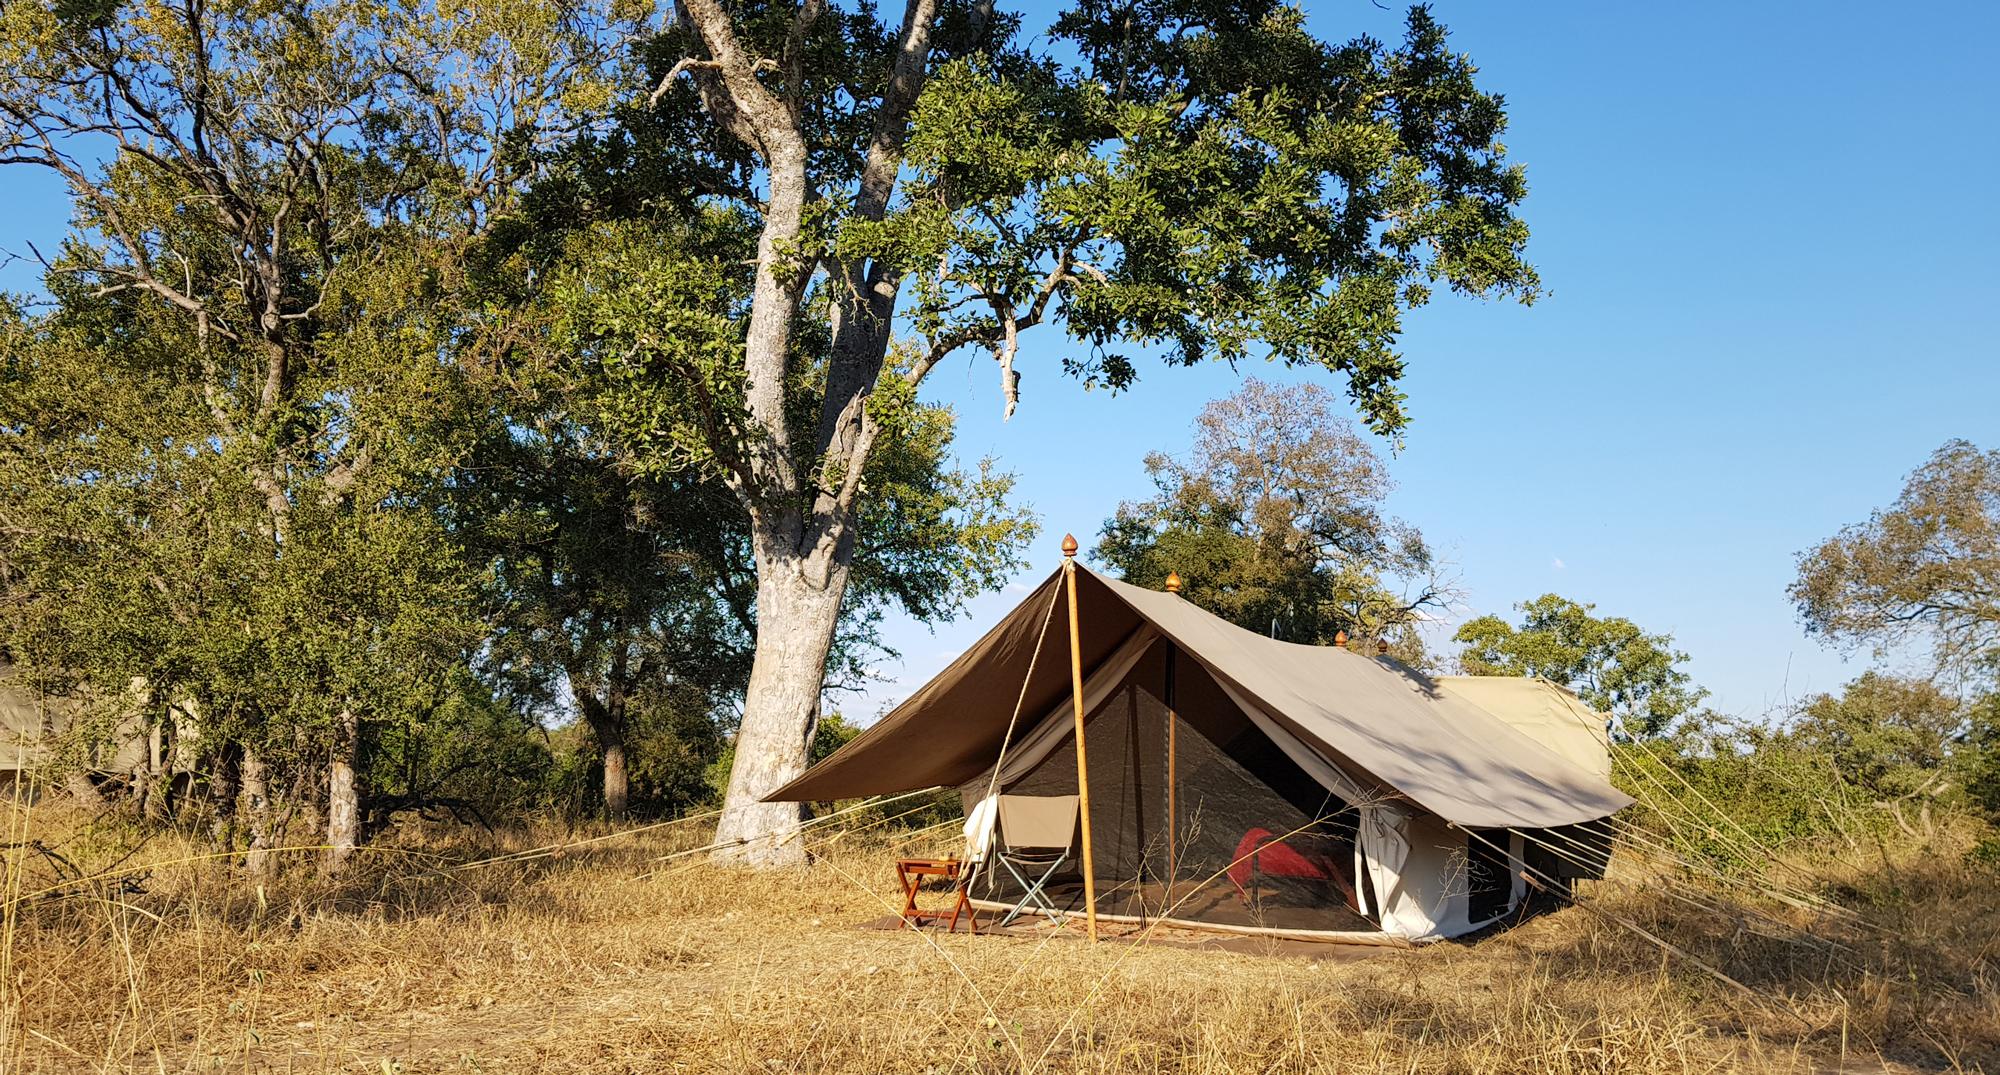 The tent accommodation at Tanda Tula Field Camp